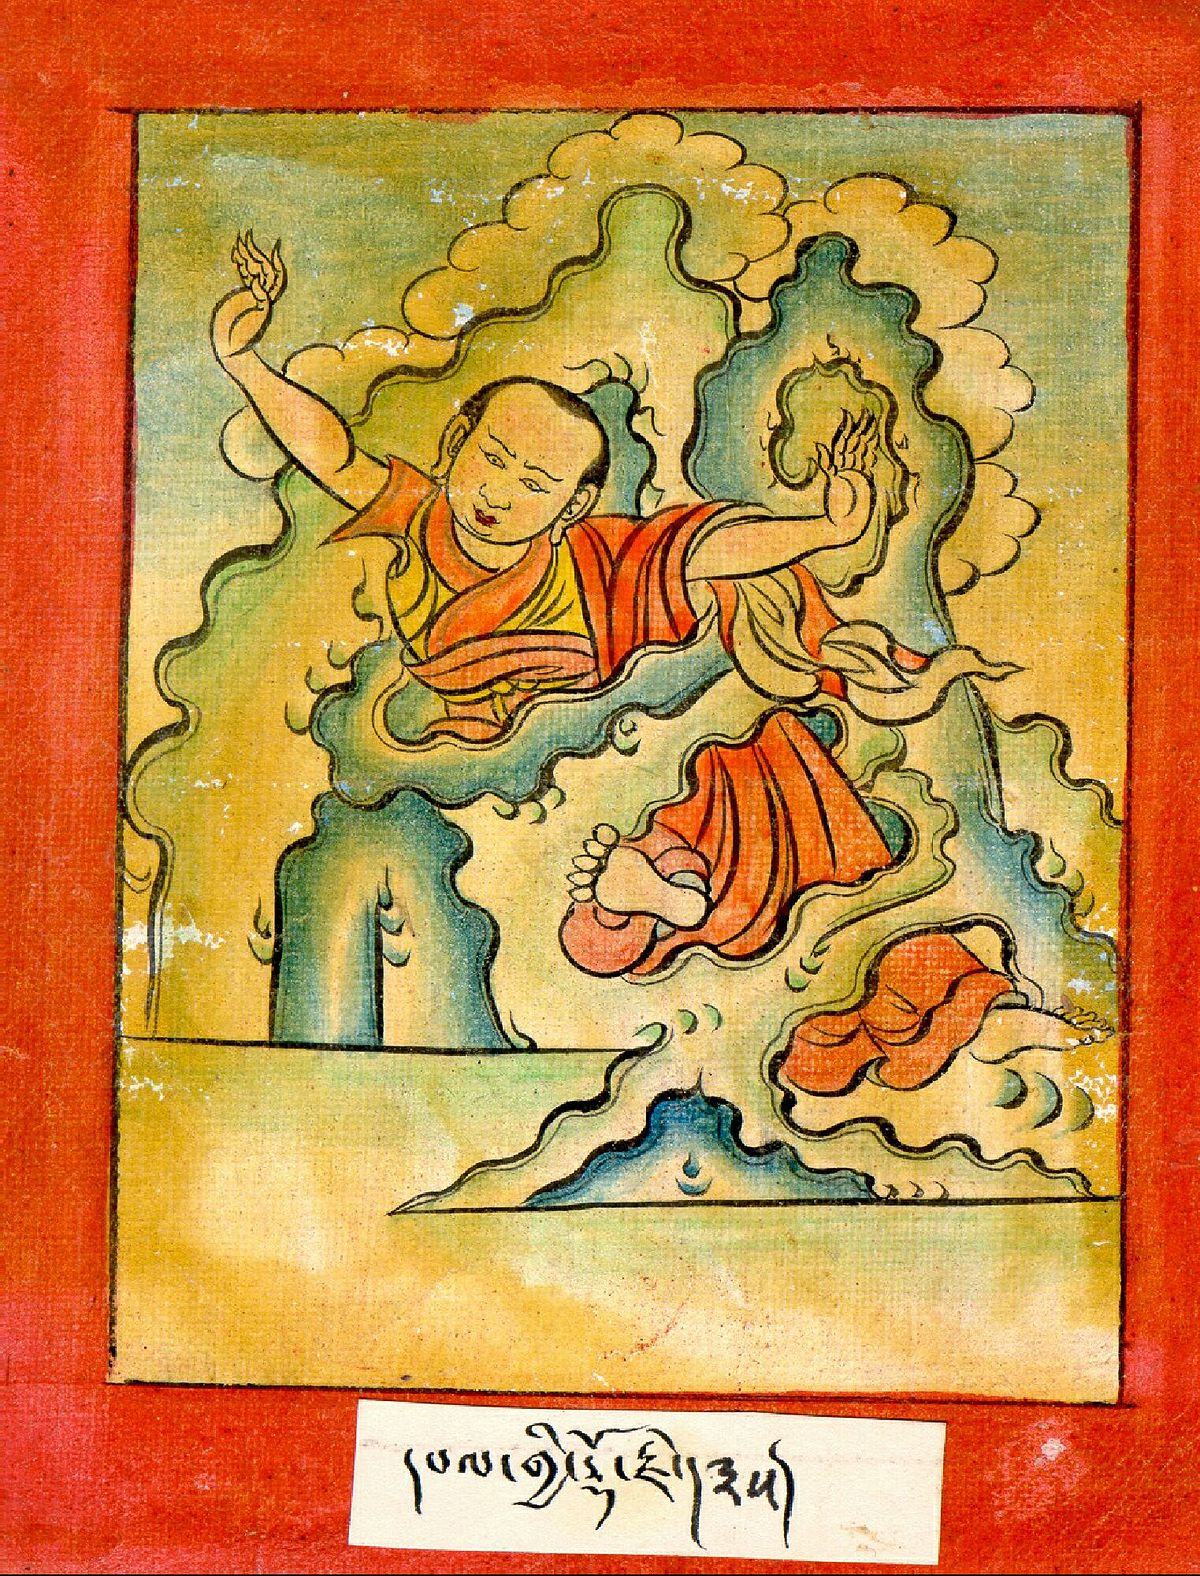 https://upload.wikimedia.org/wikipedia/commons/thumb/7/76/Lhalung_Palgyi_Dorje.jpg/1200px-Lhalung_Palgyi_Dorje.jpg